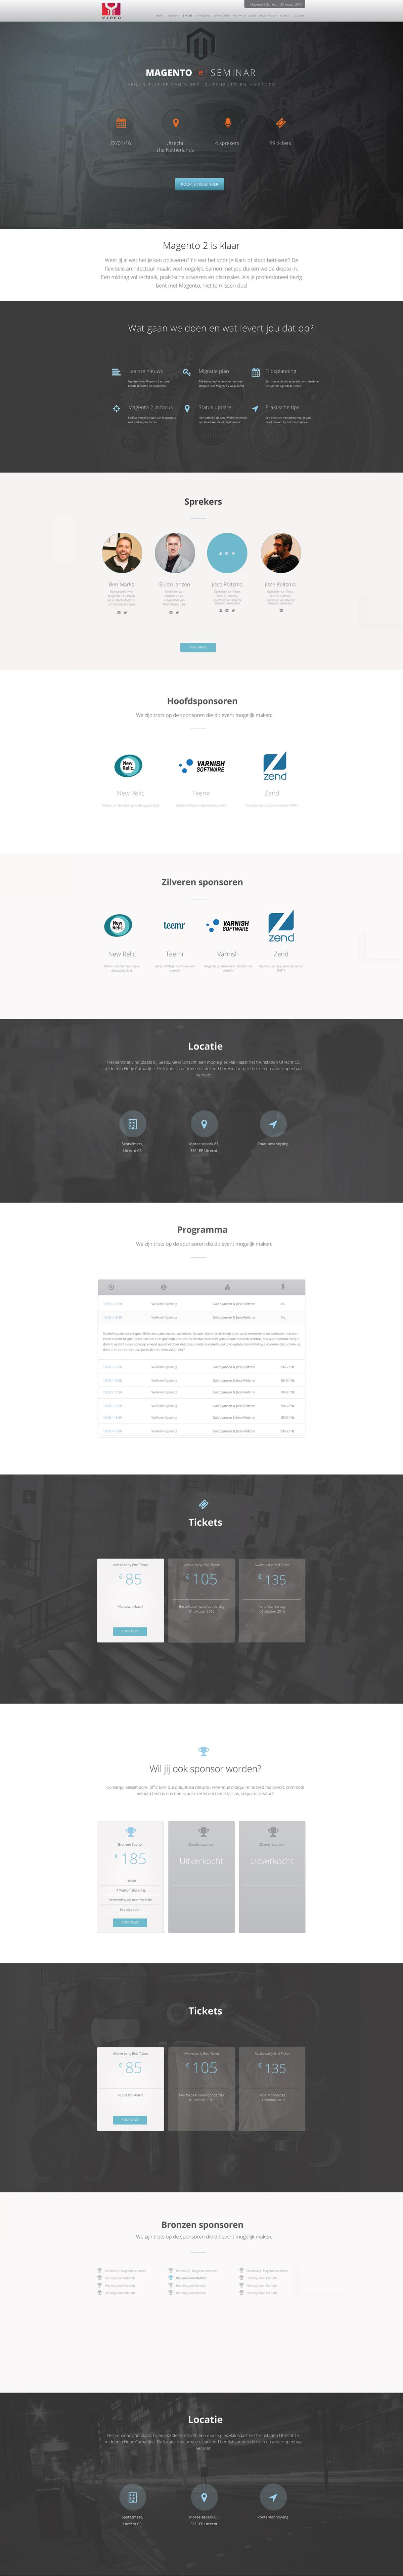 ontwerp-website-seminar-2